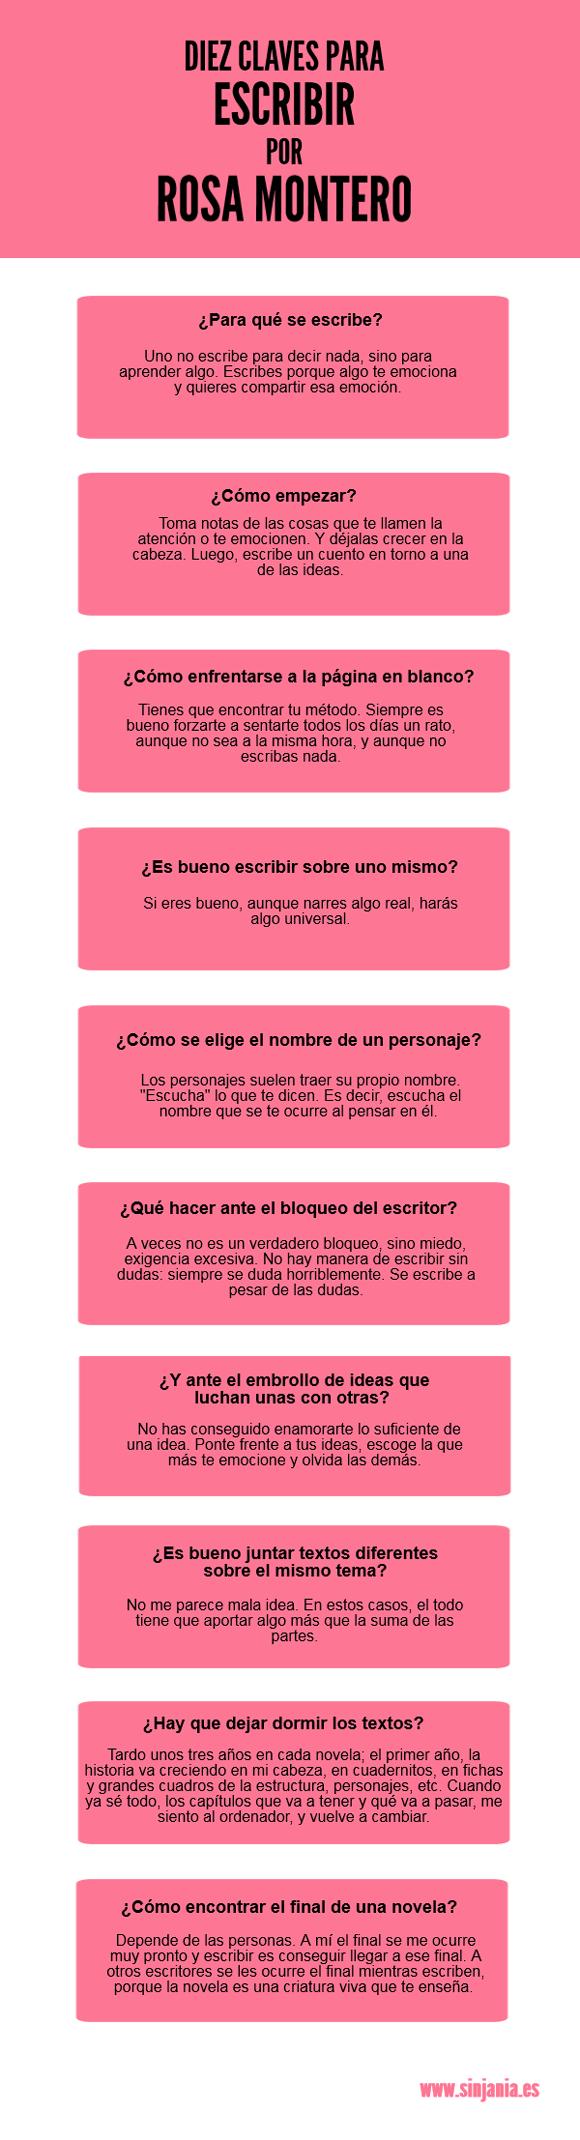 Diez claves para escribir de Rosa Montero